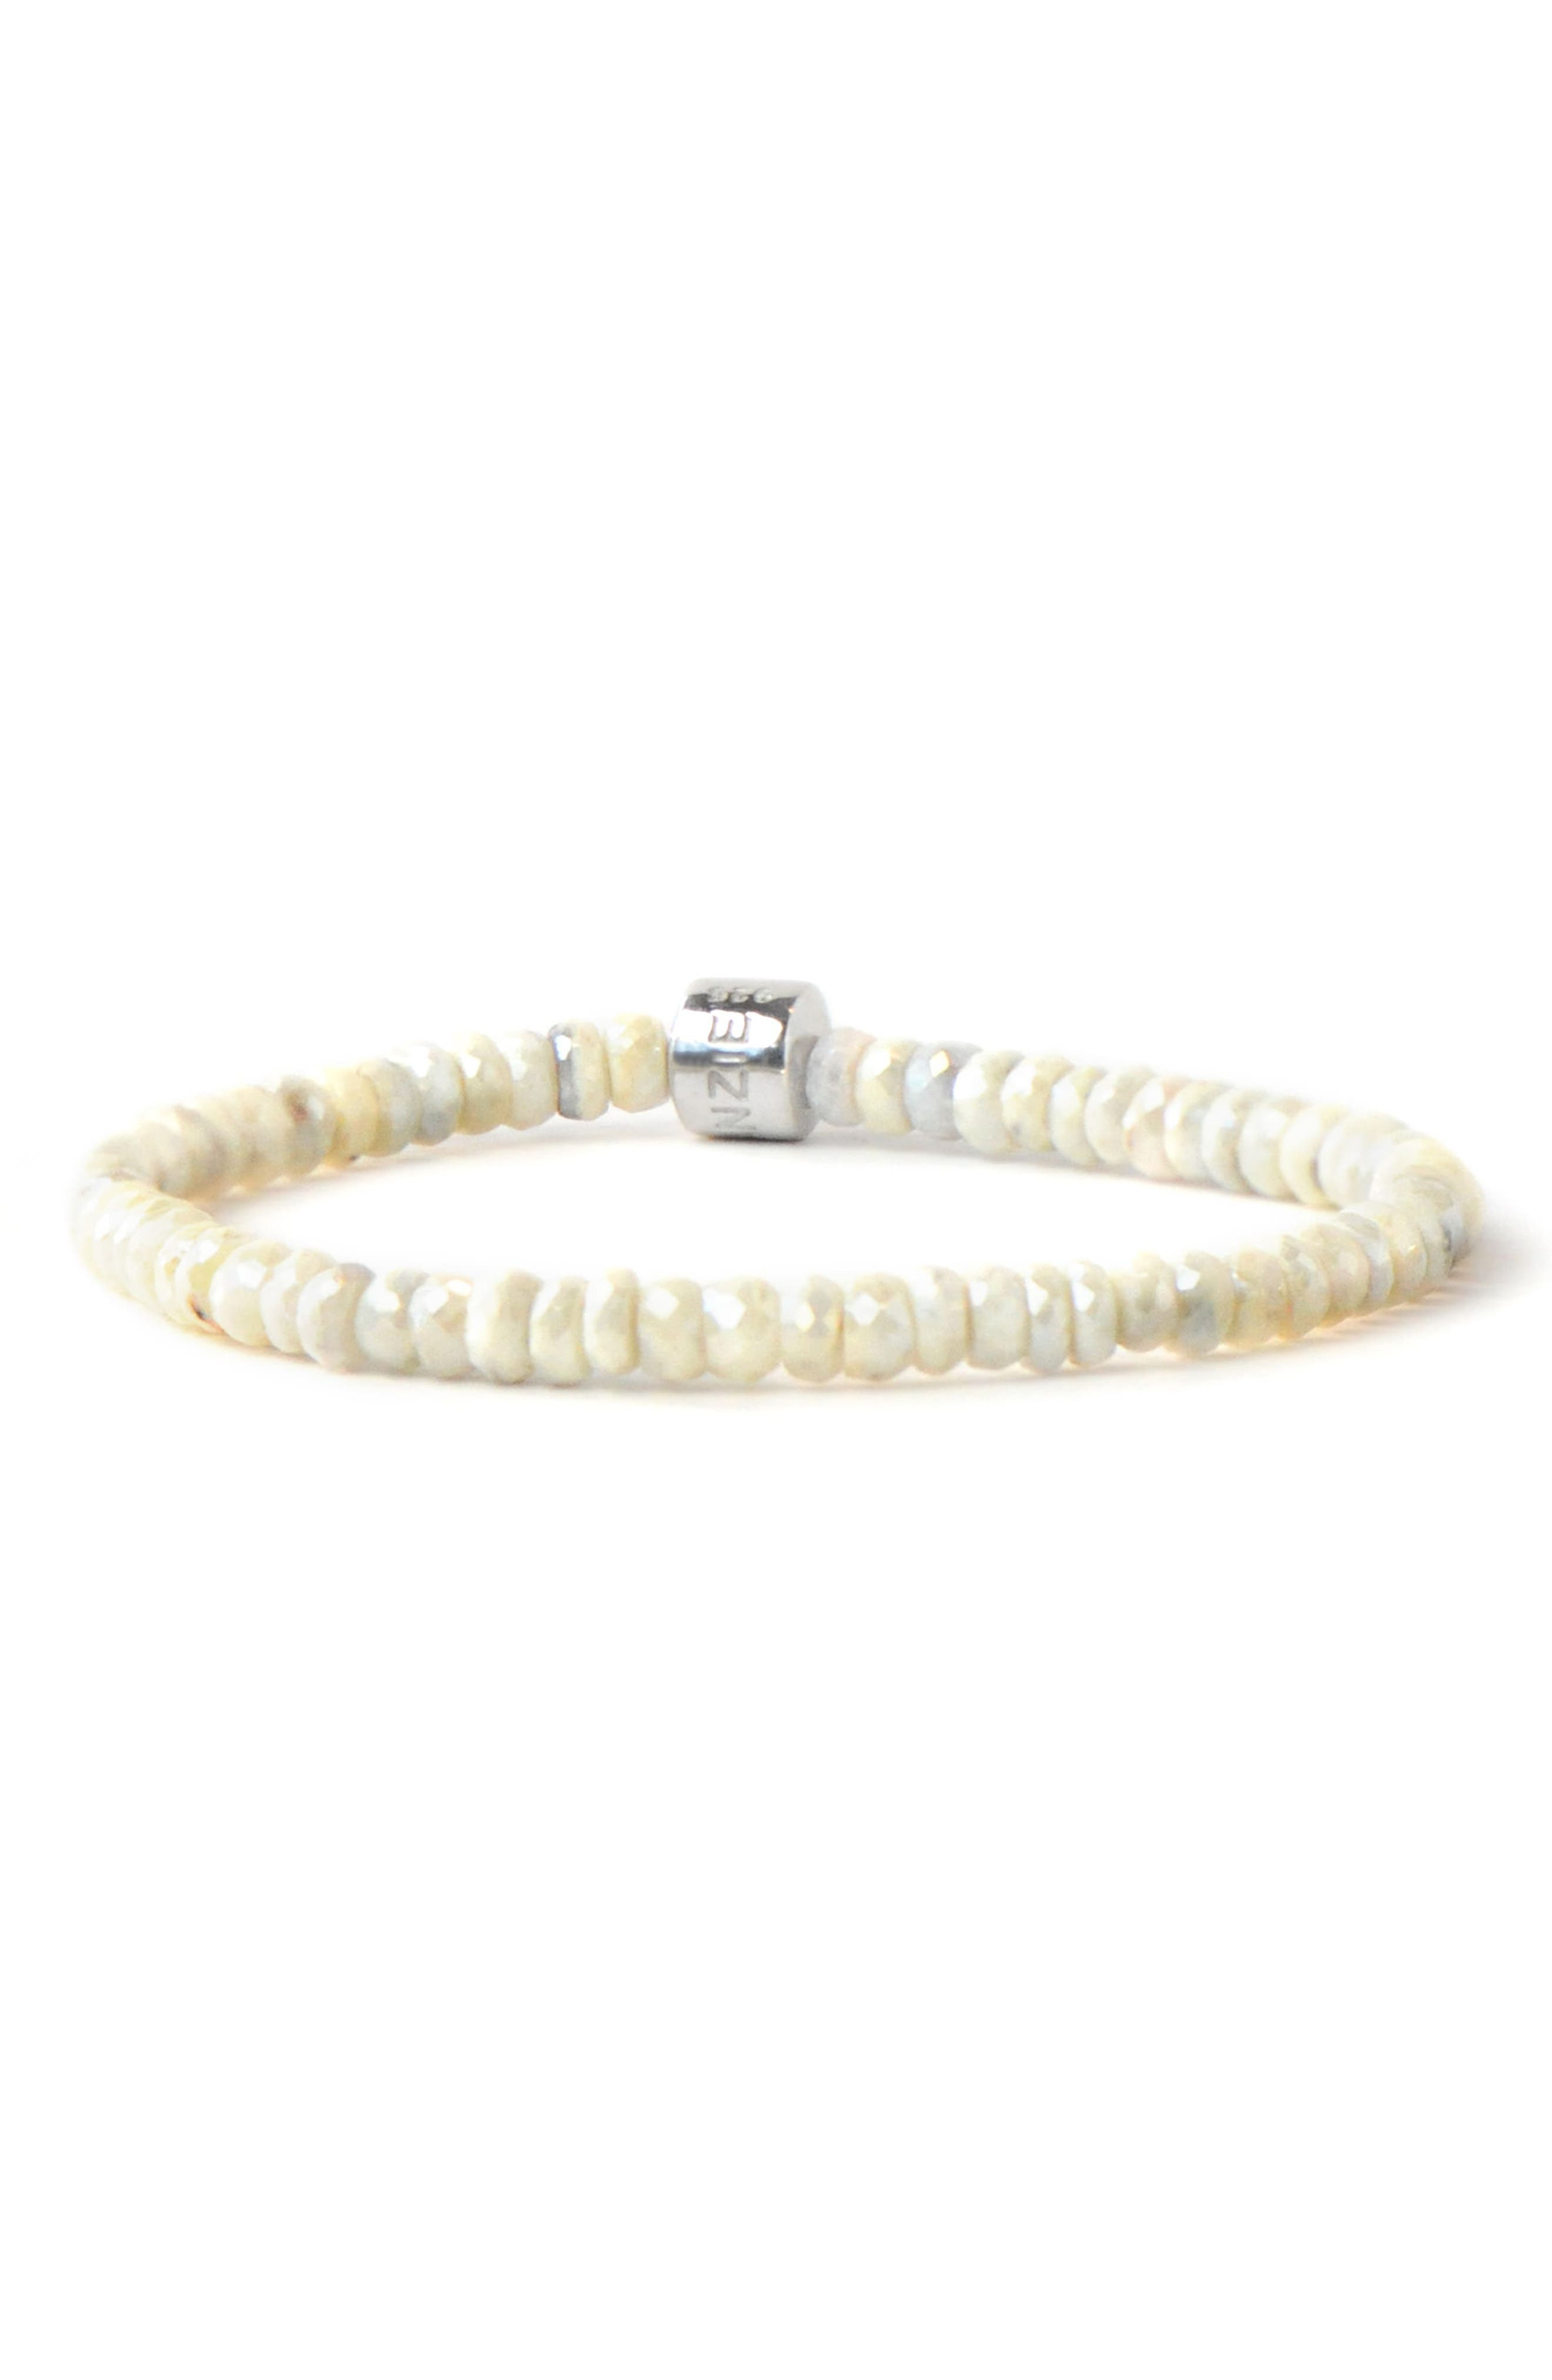 ANZIE, Boheme White Silverite Rondelle Bracelet, Main thumbnail 1, color, SILVER